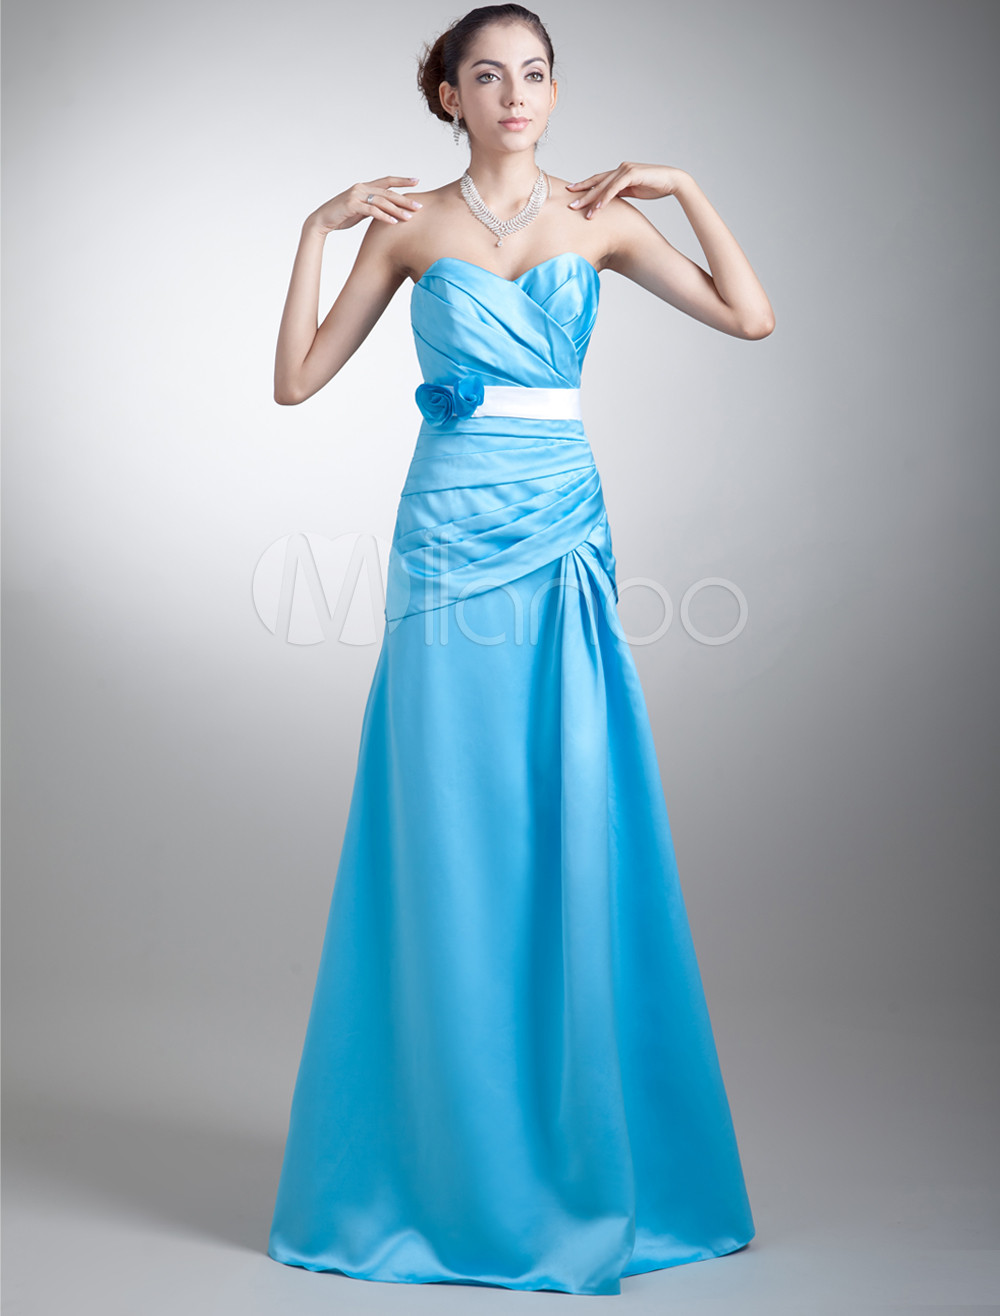 Sheath Blue Satin Floral Sweetheart Neck Fashion Bridesmaid Dress